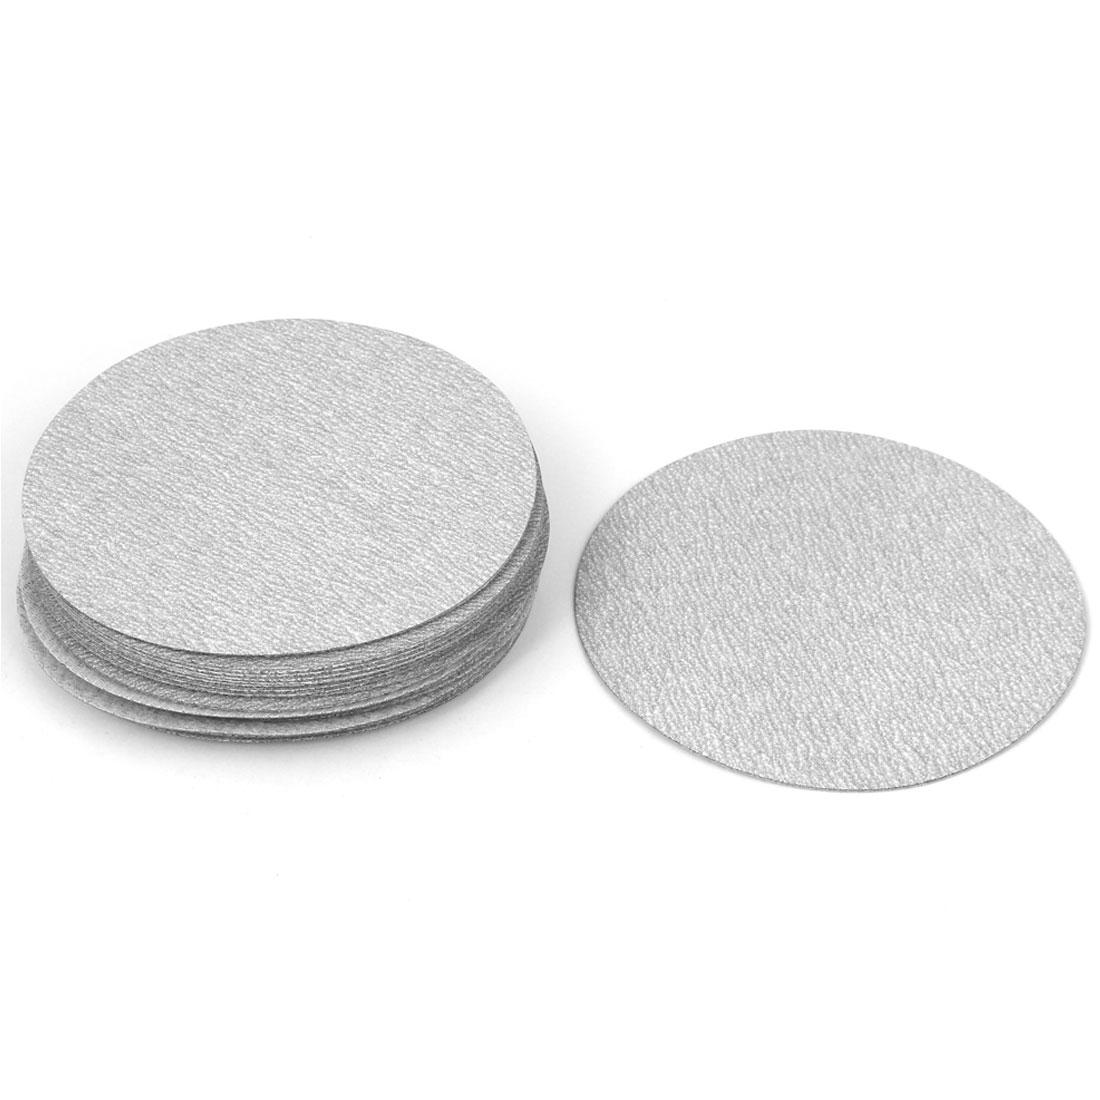 "4"" Dia Polishing Round Sanding Flocking Sandpaper Disc 320 Grit 20 Pcs"